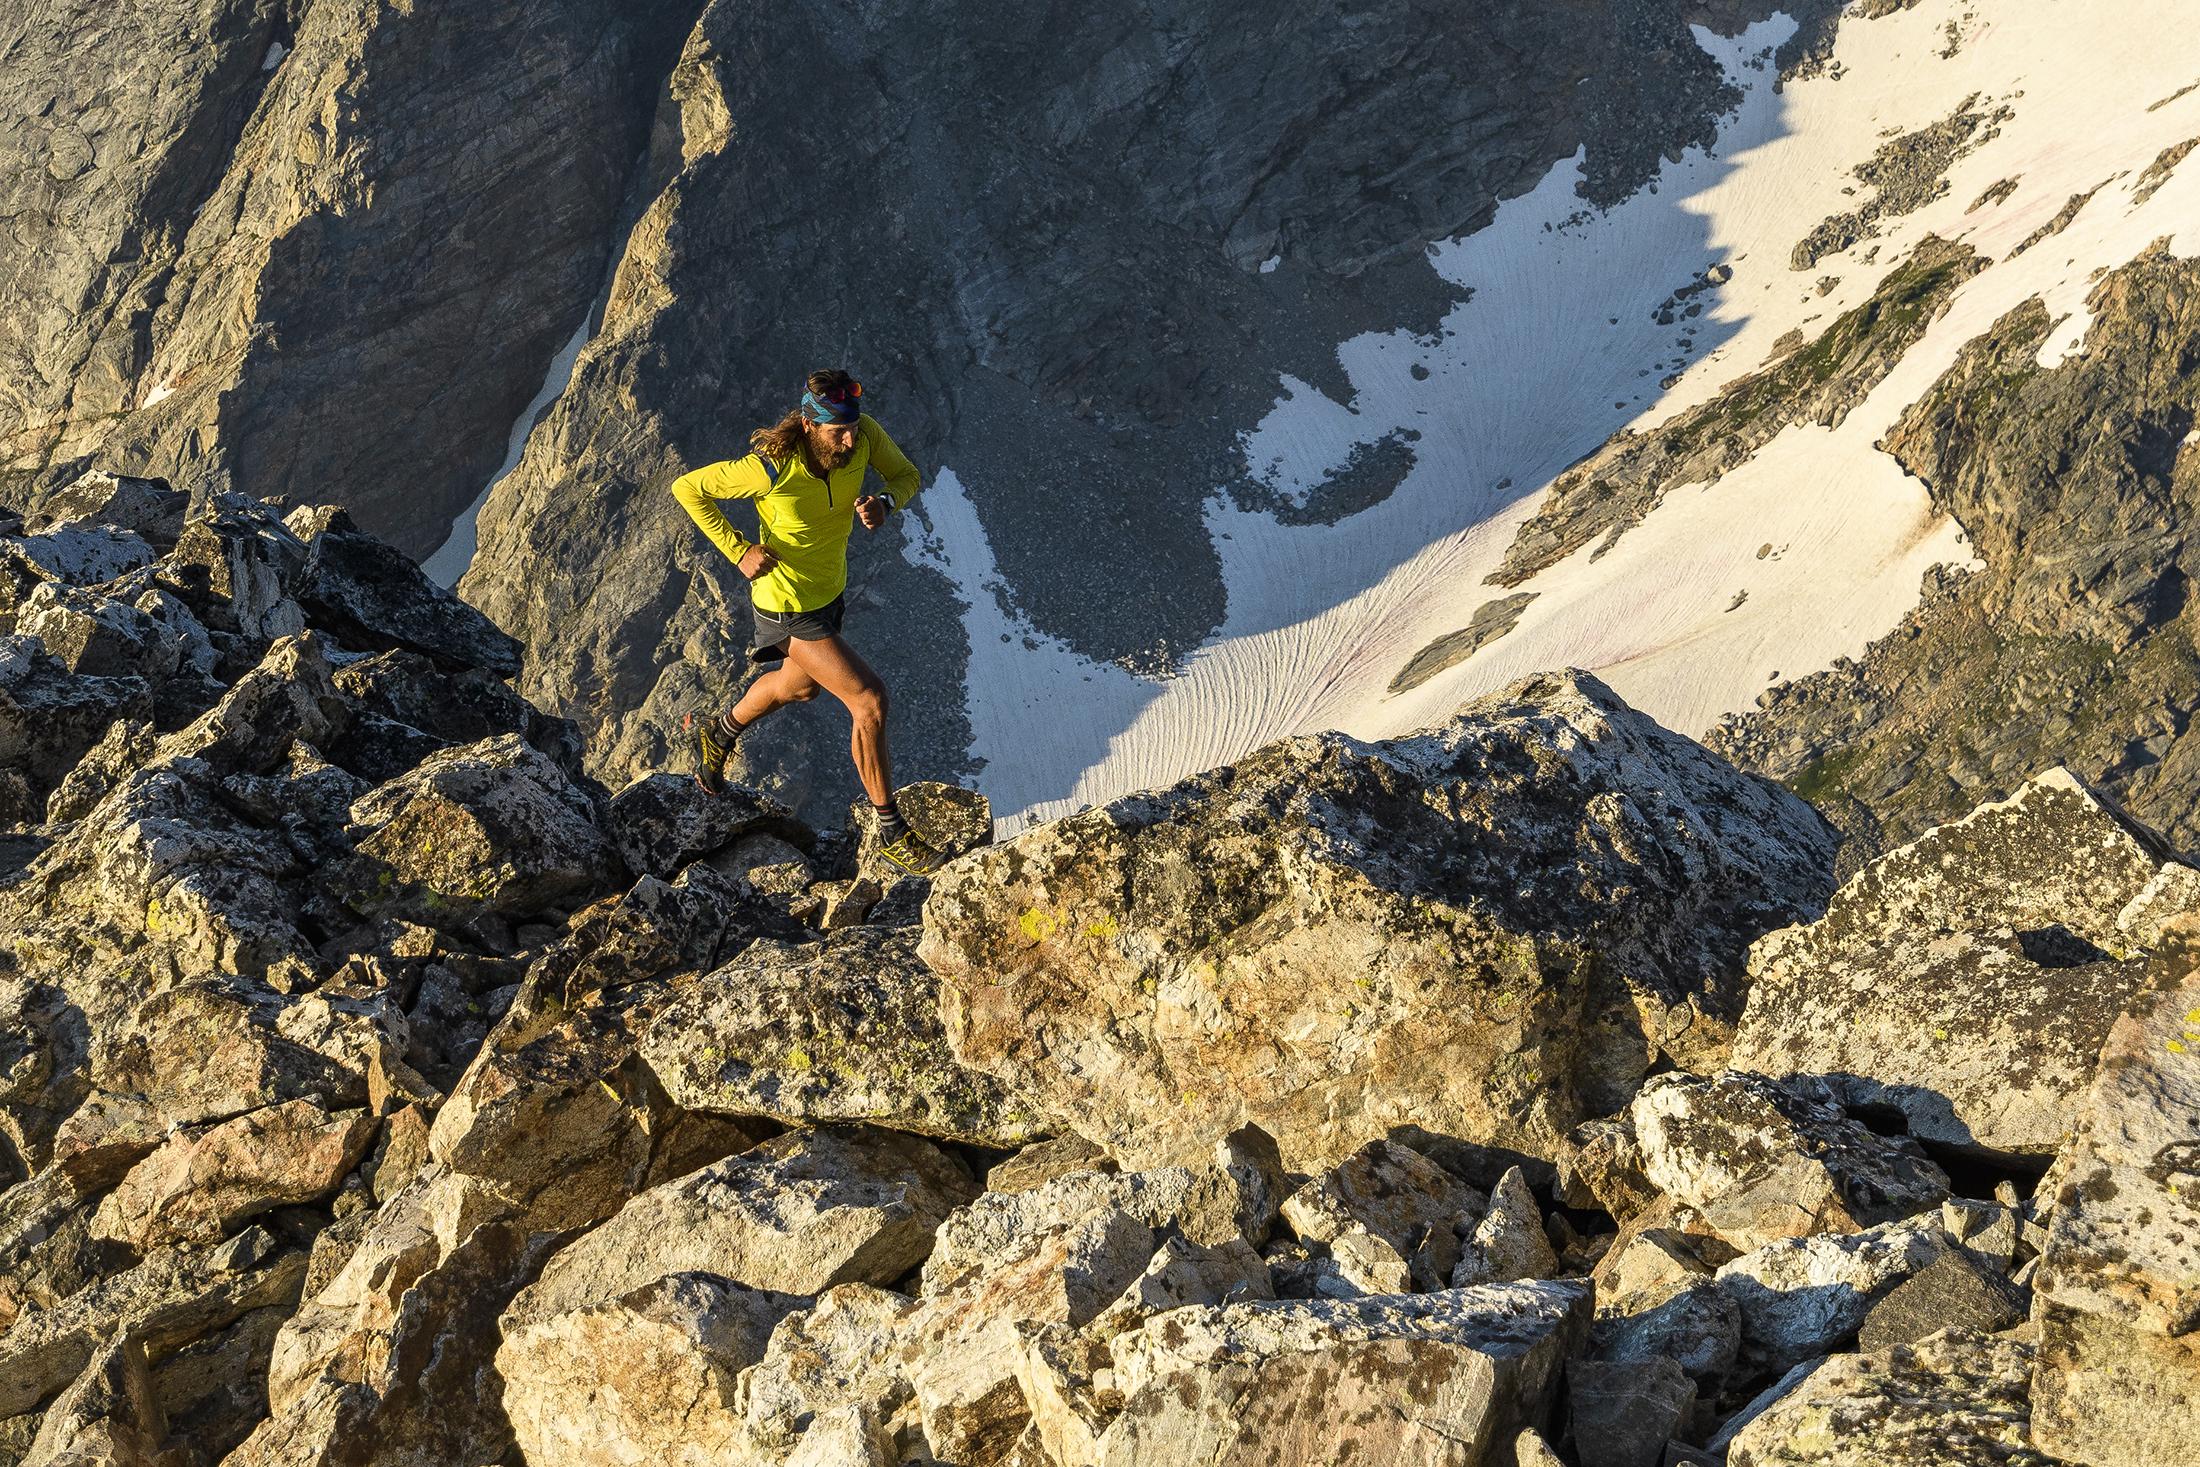 Anton-lasportiva-mountains_credit-Fred-Marmsater